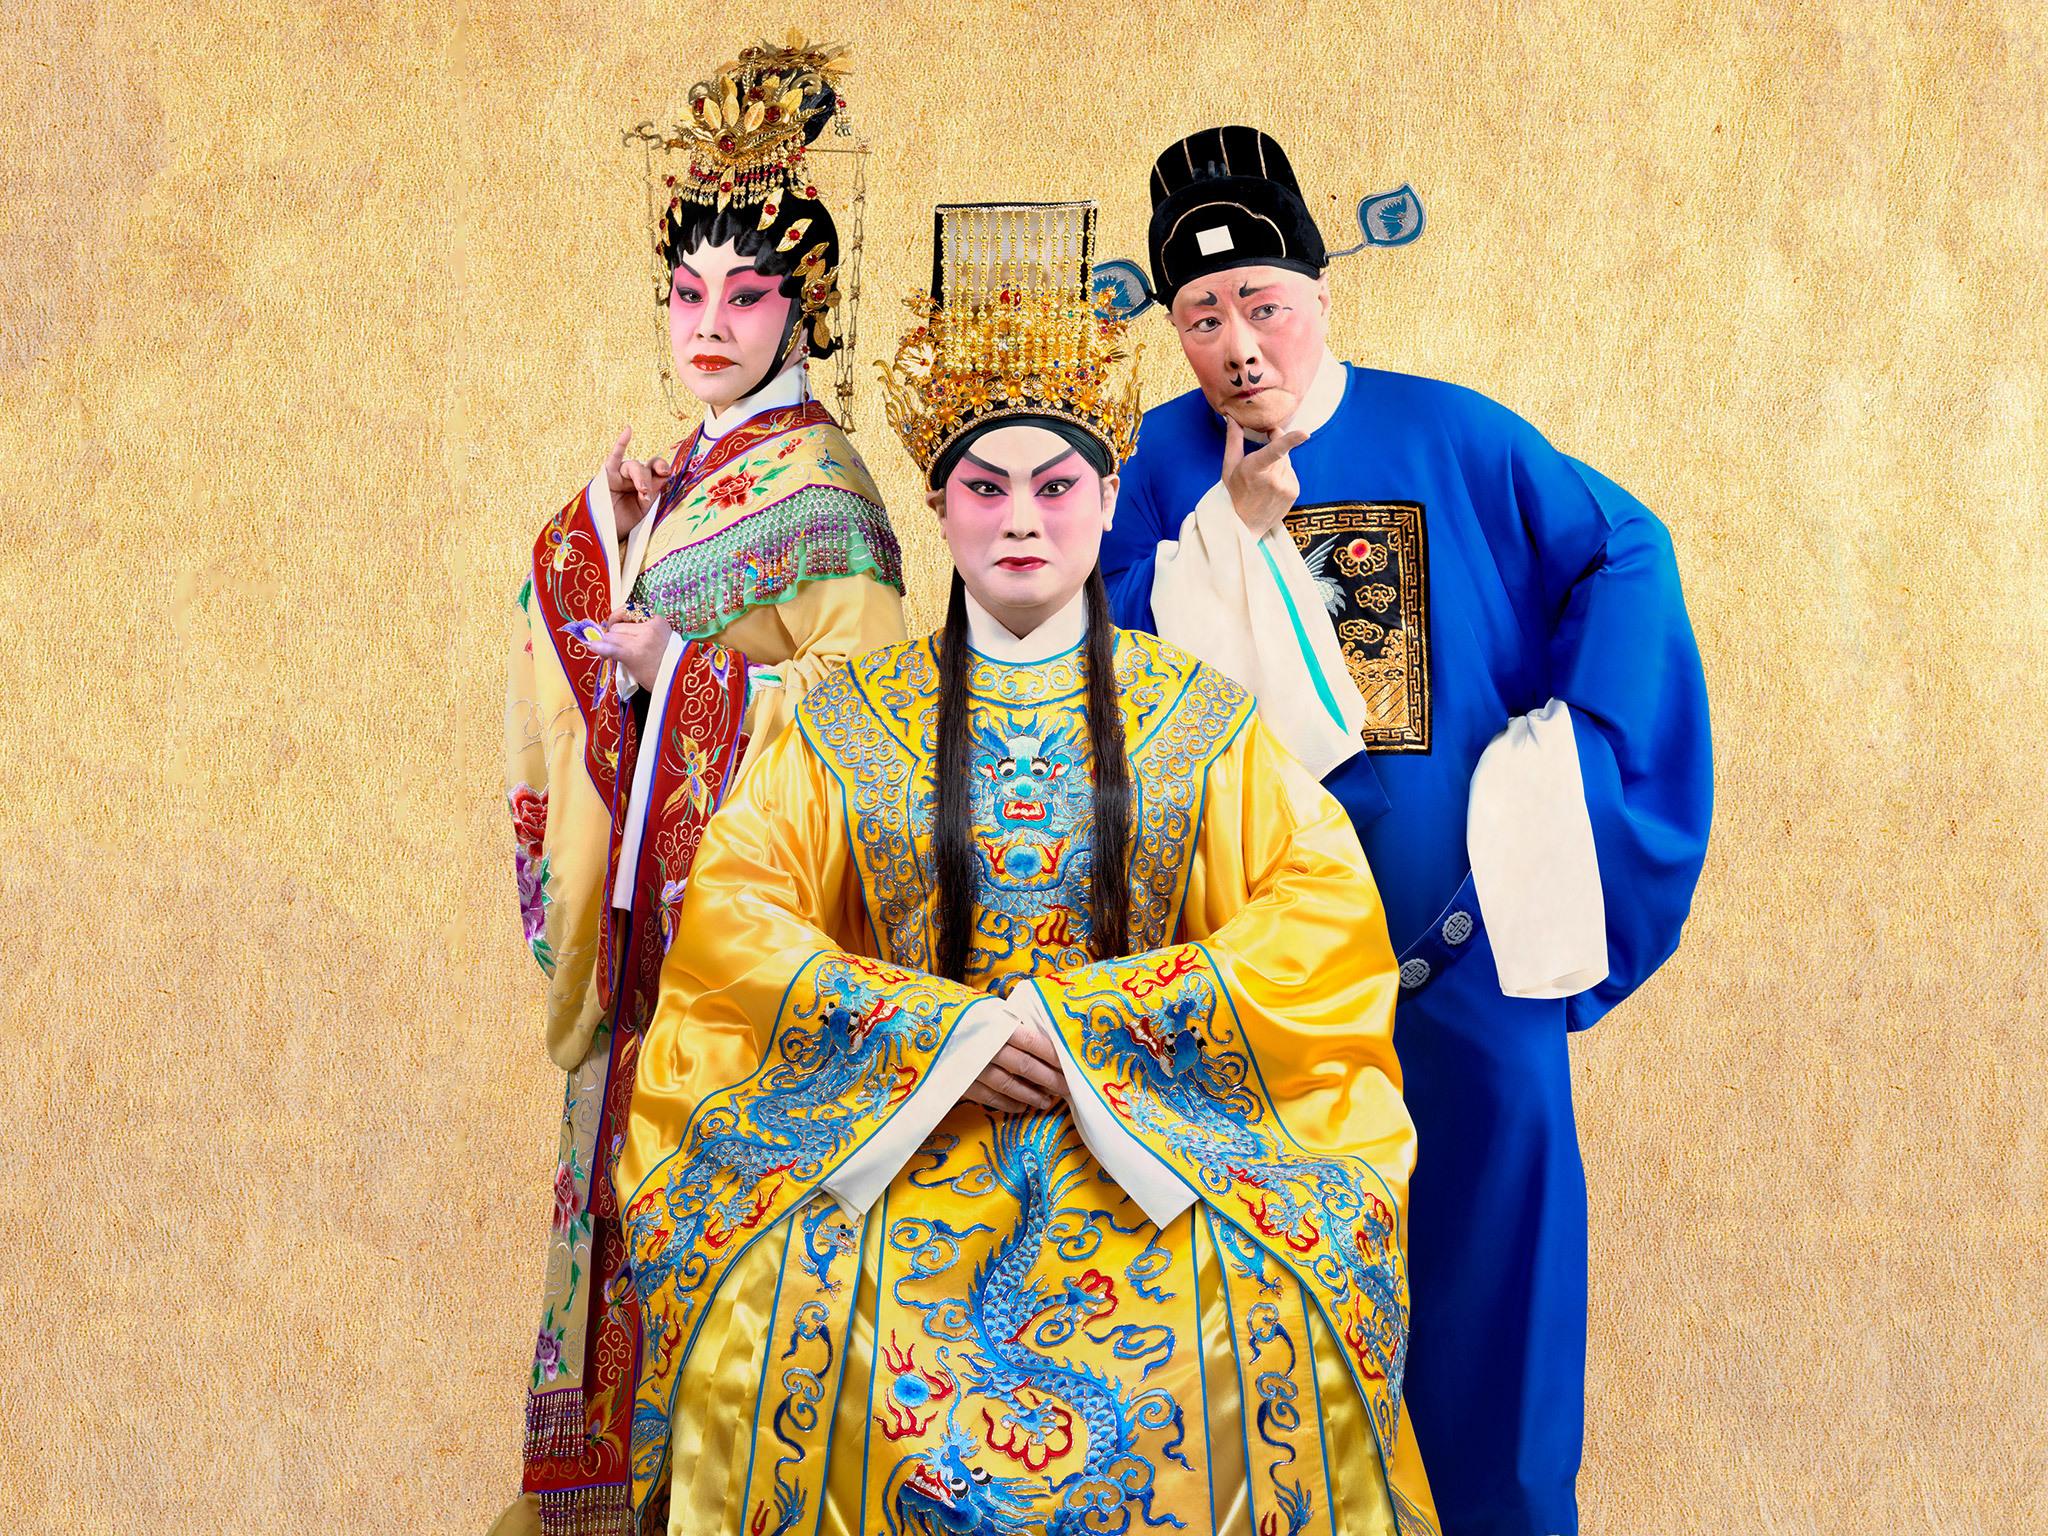 The 45th Hong Kong Arts Festival